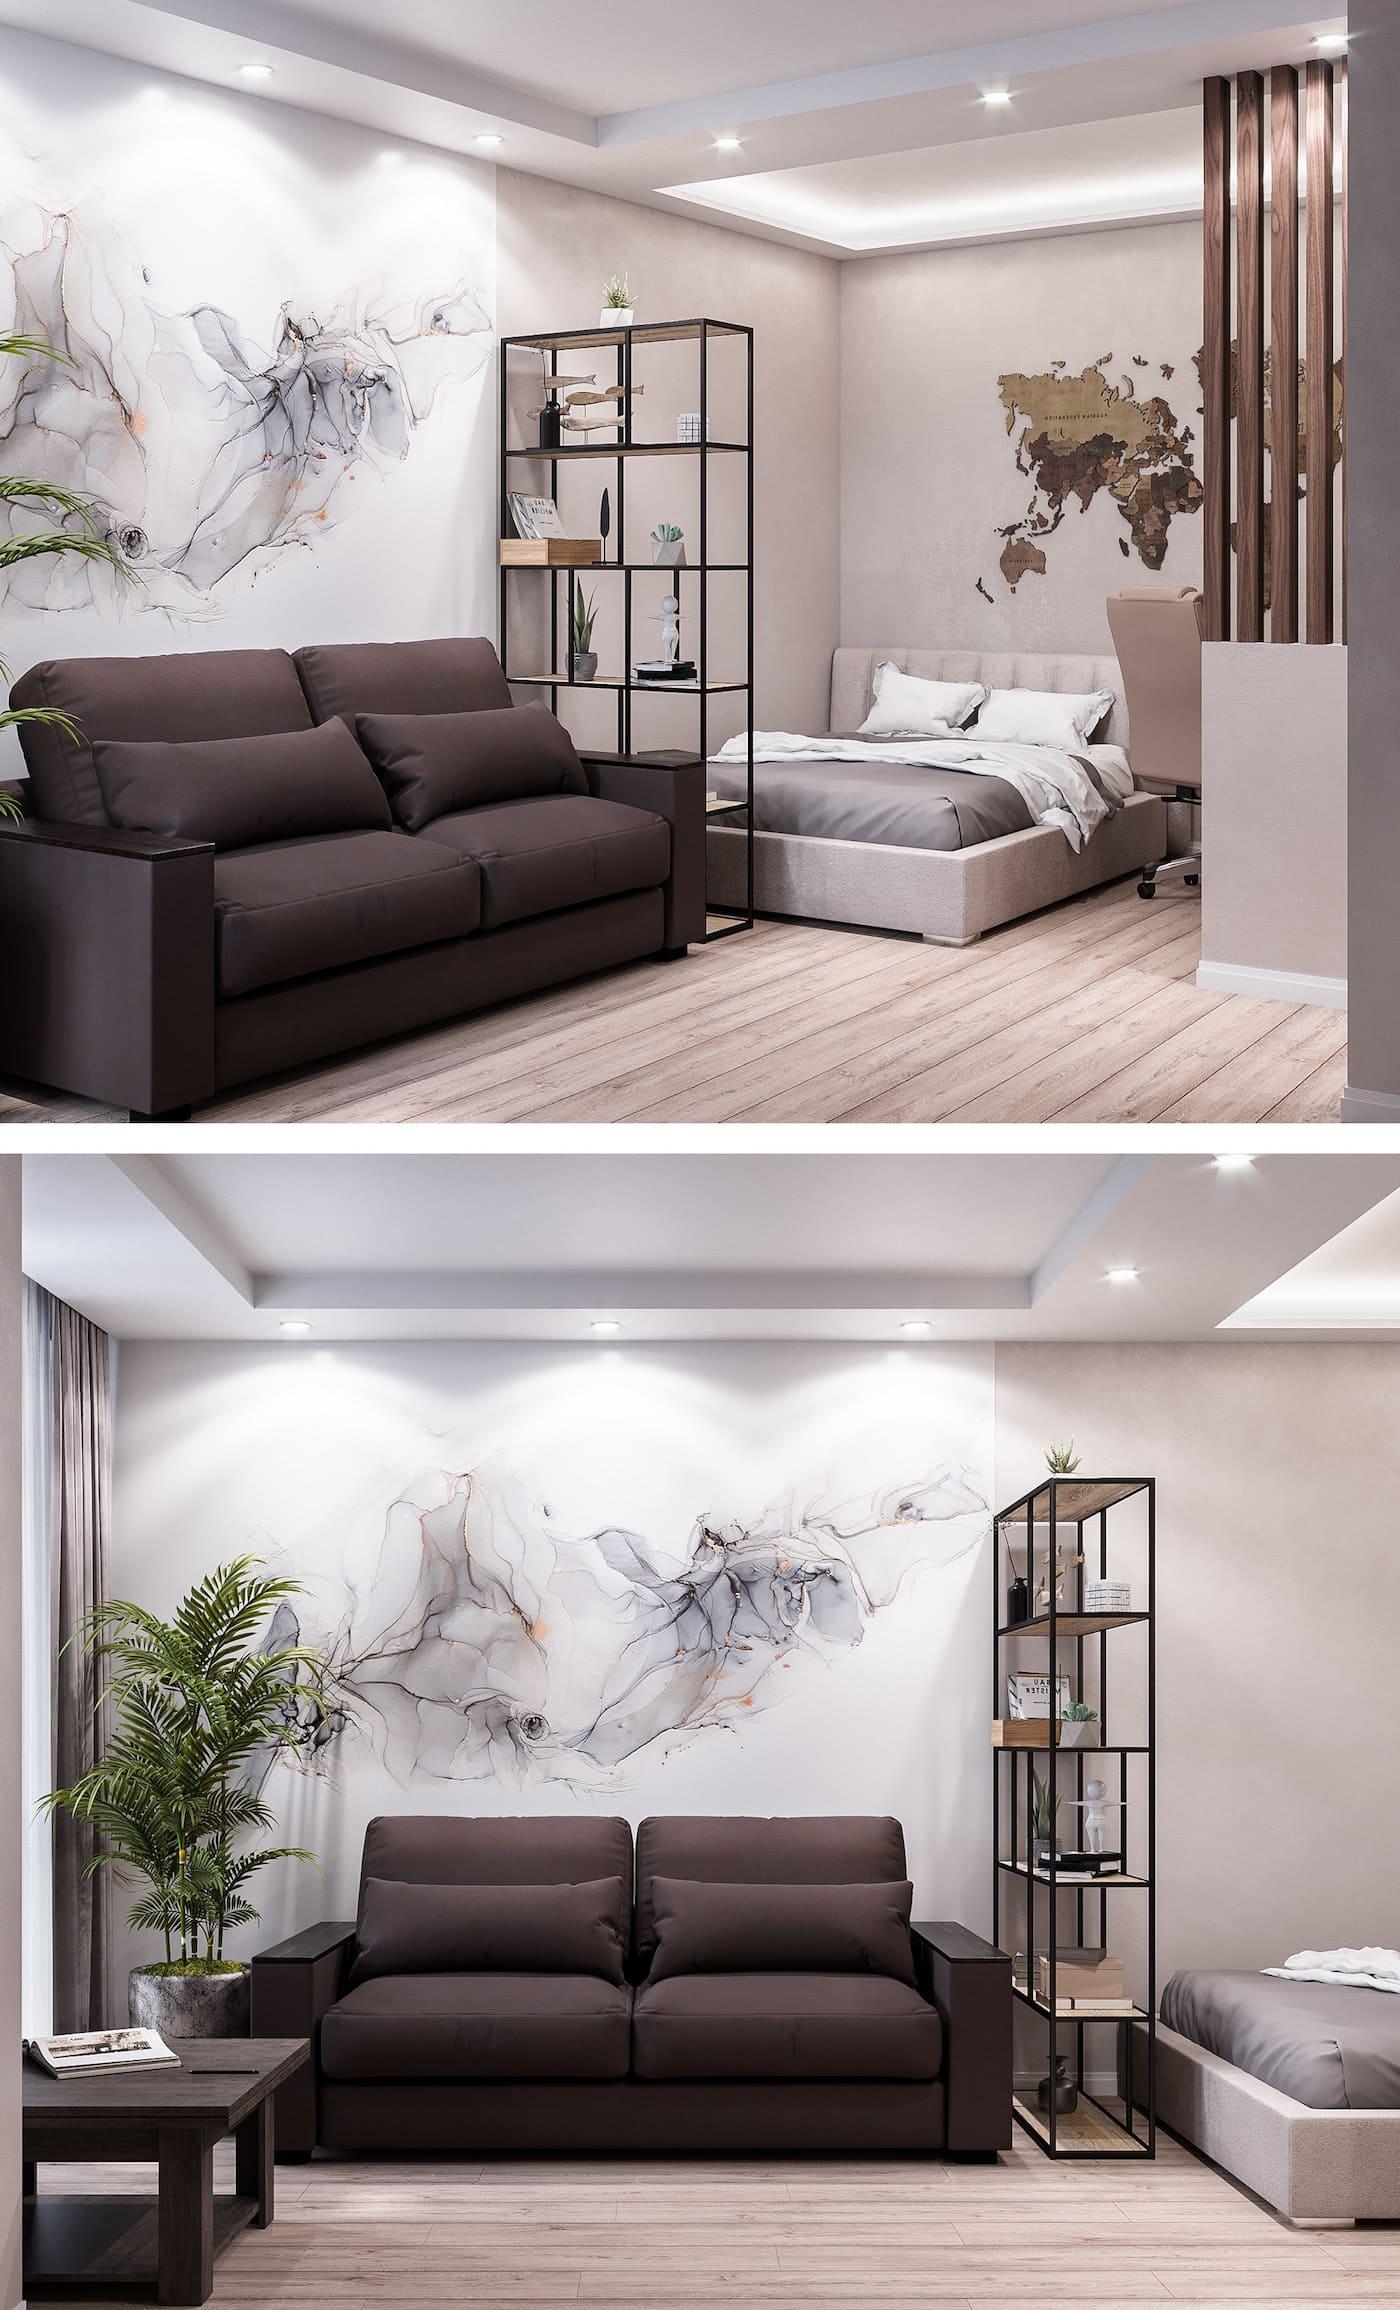 дизайн однокомнатной квартиры фото 22